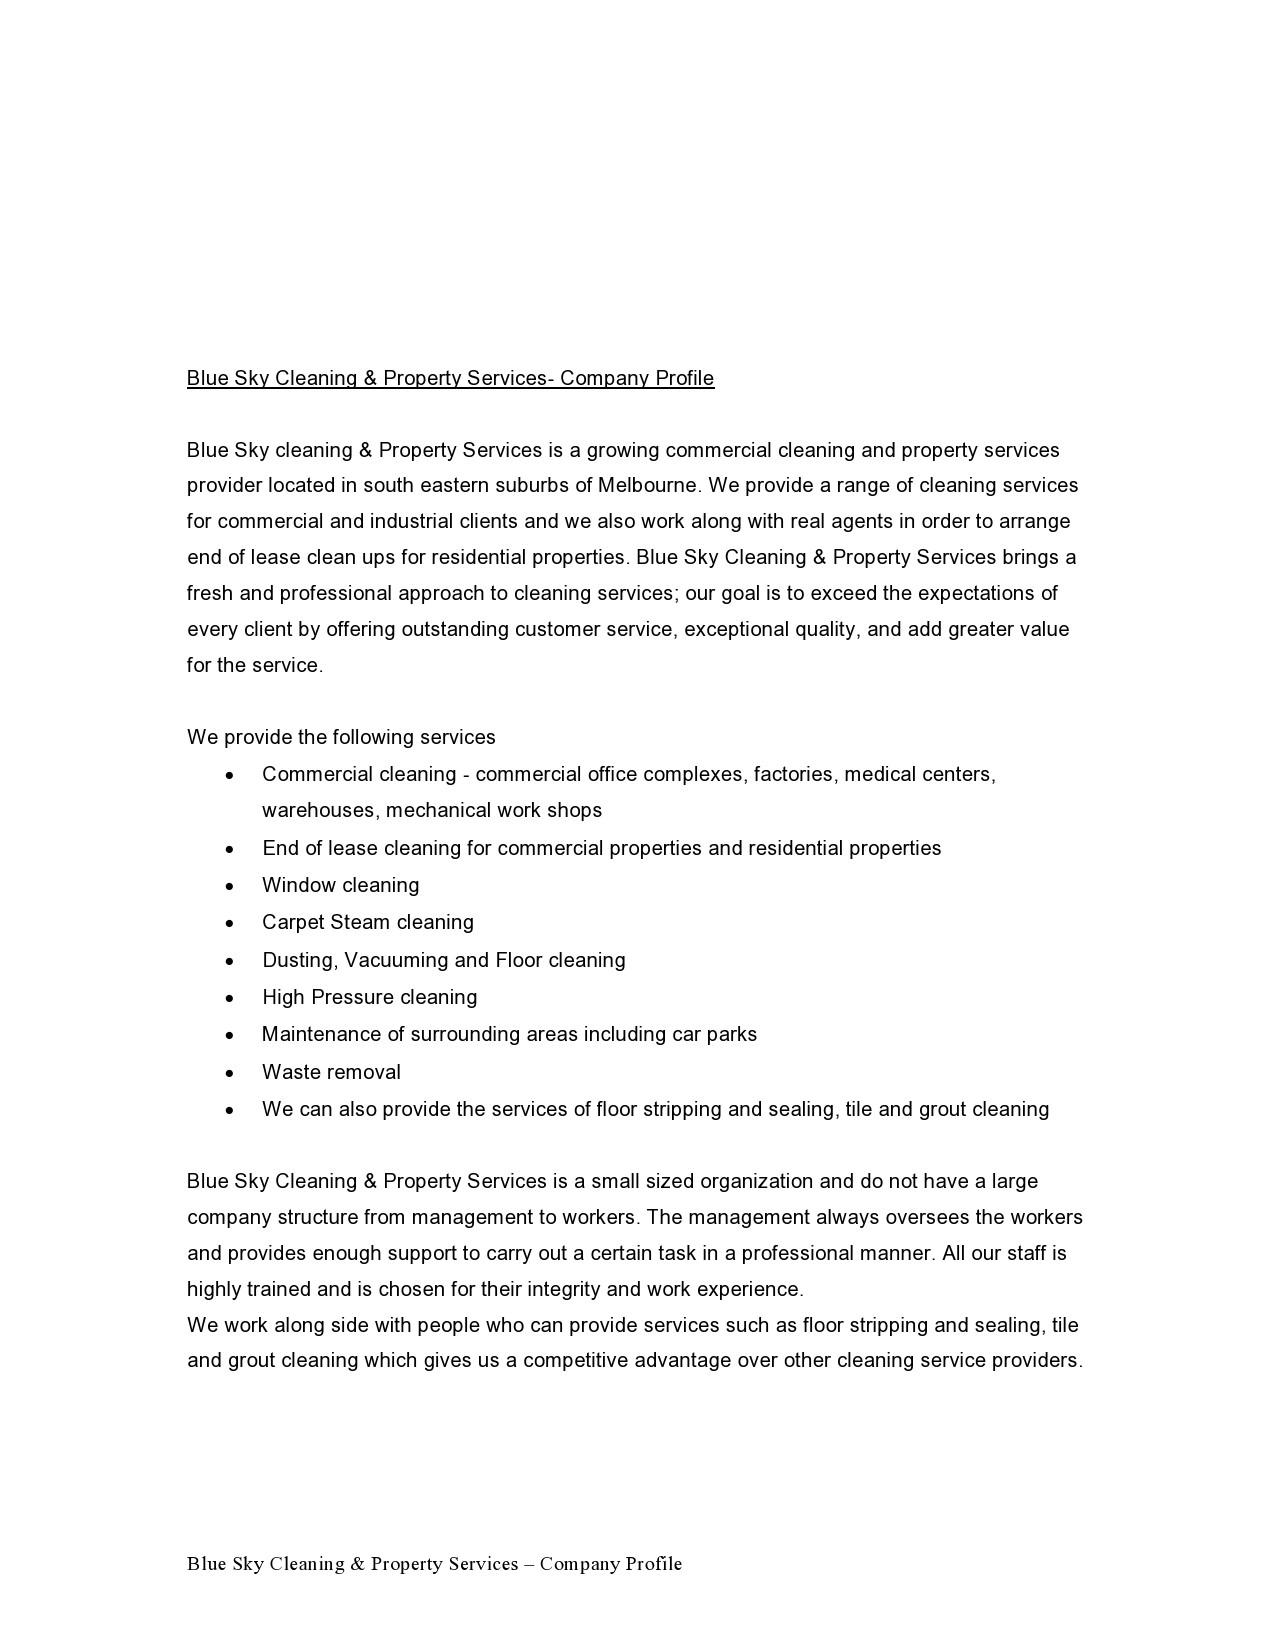 Free company profile template 29